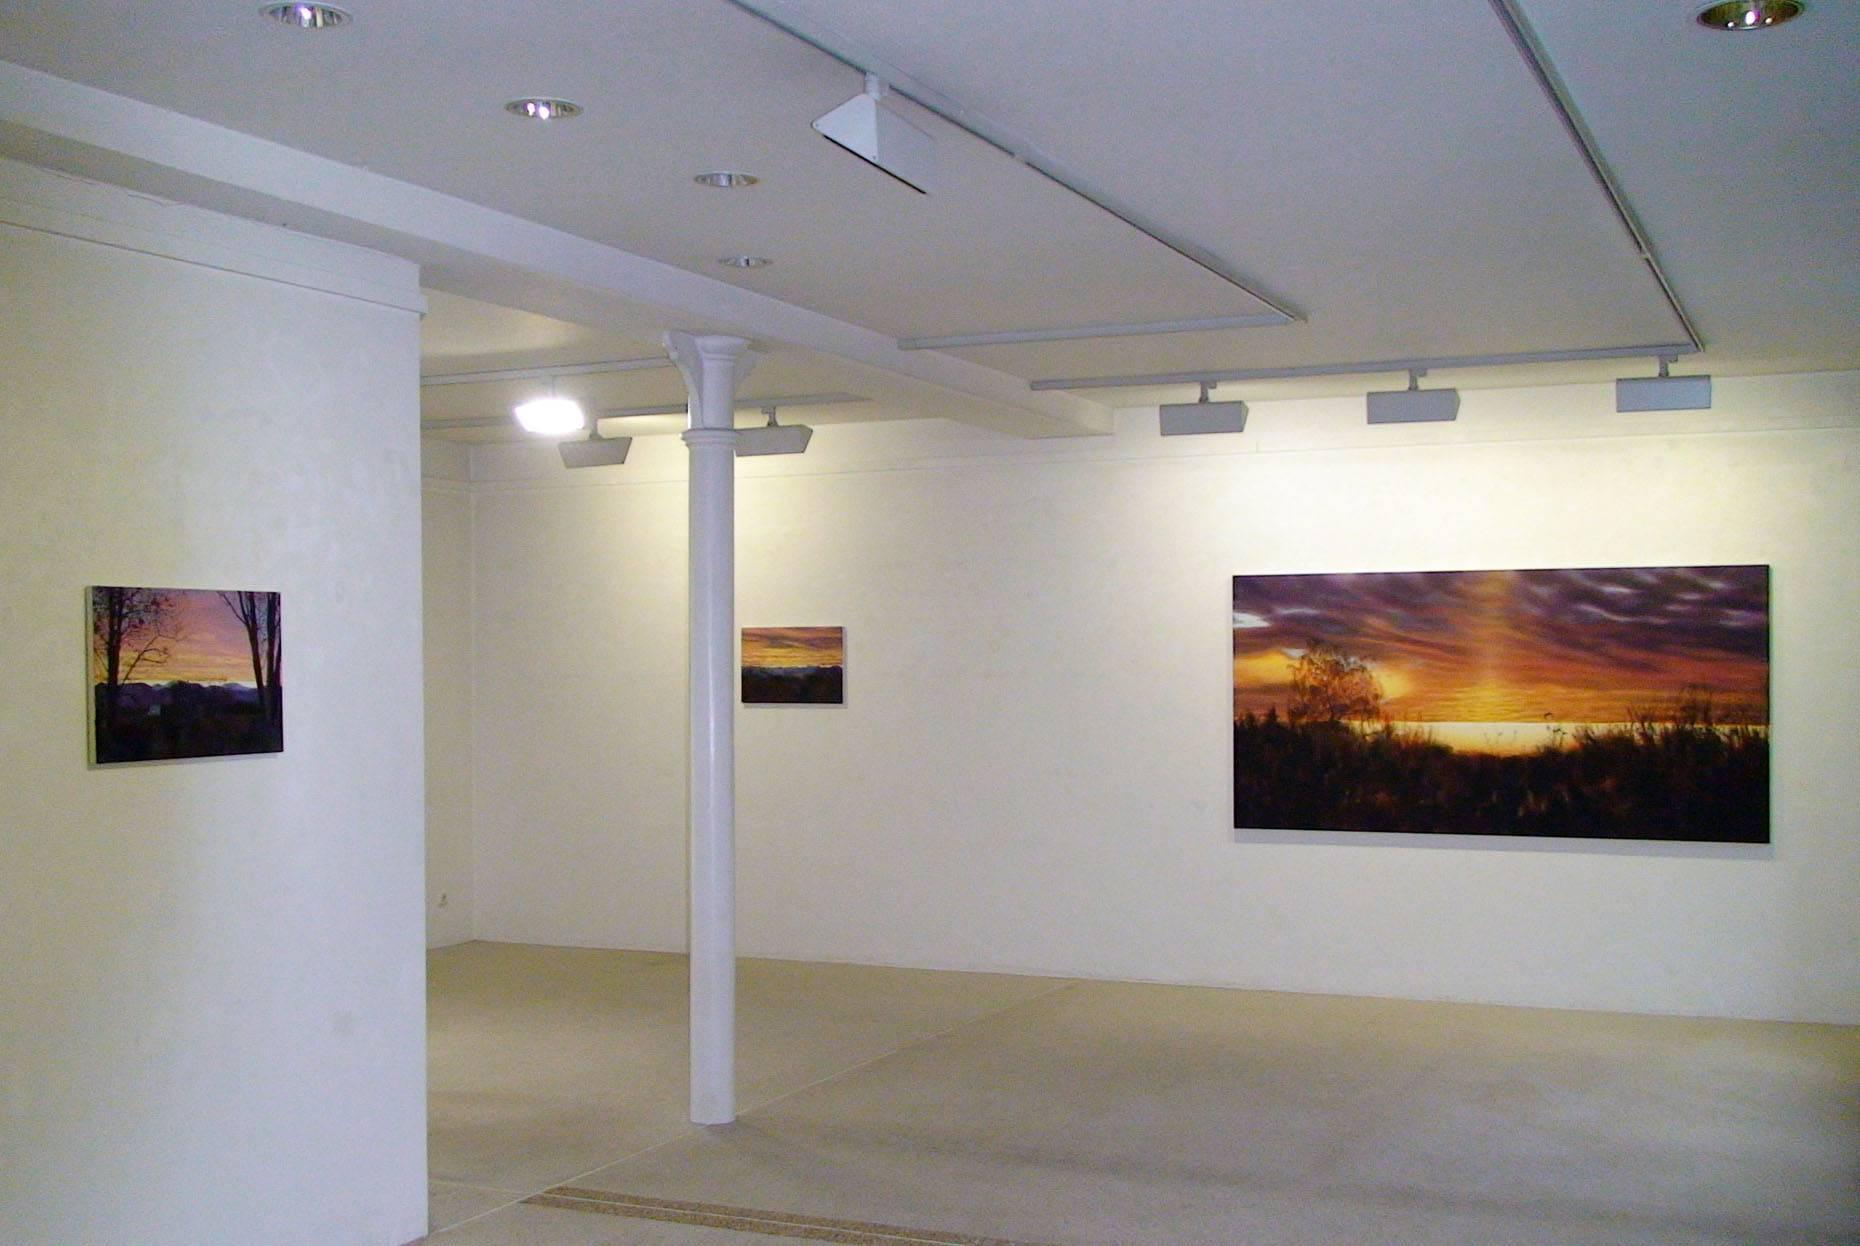 ins Offene 2009 Galerie Konrad Mönter Meerbusch-Osterath